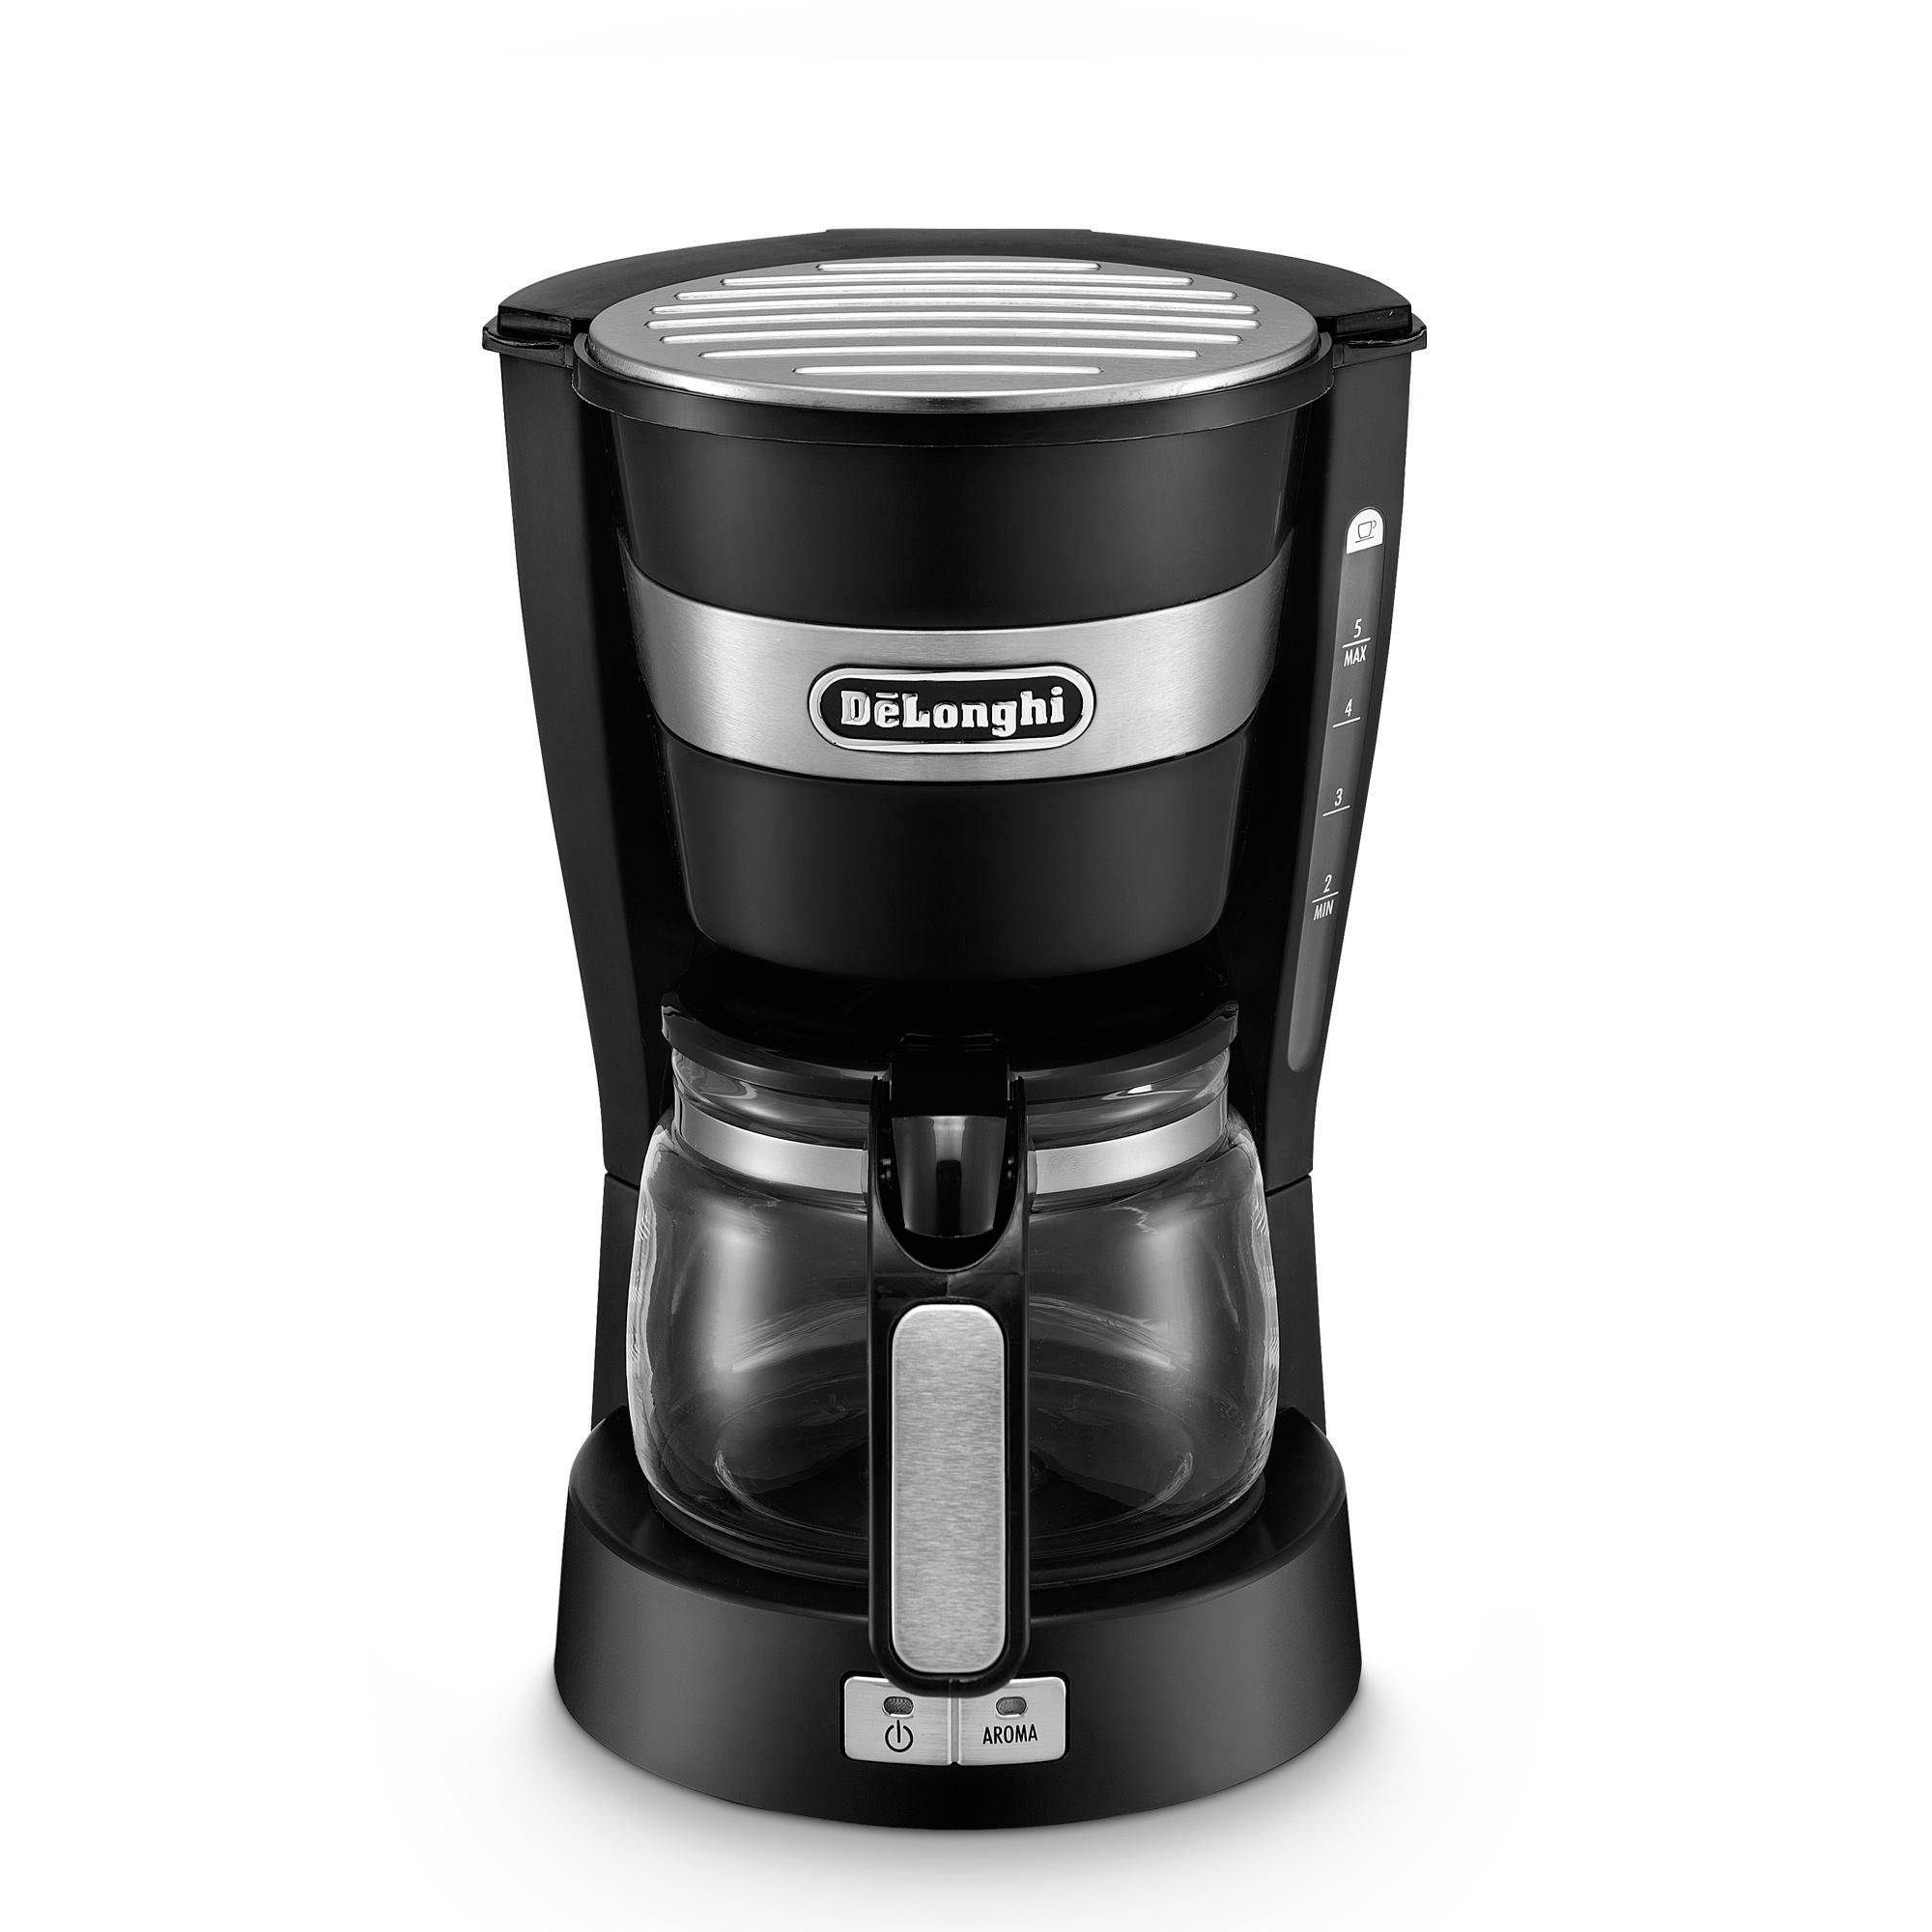 Delonghi/德龙 ICM14011 咖啡机质量好吗,好用吗